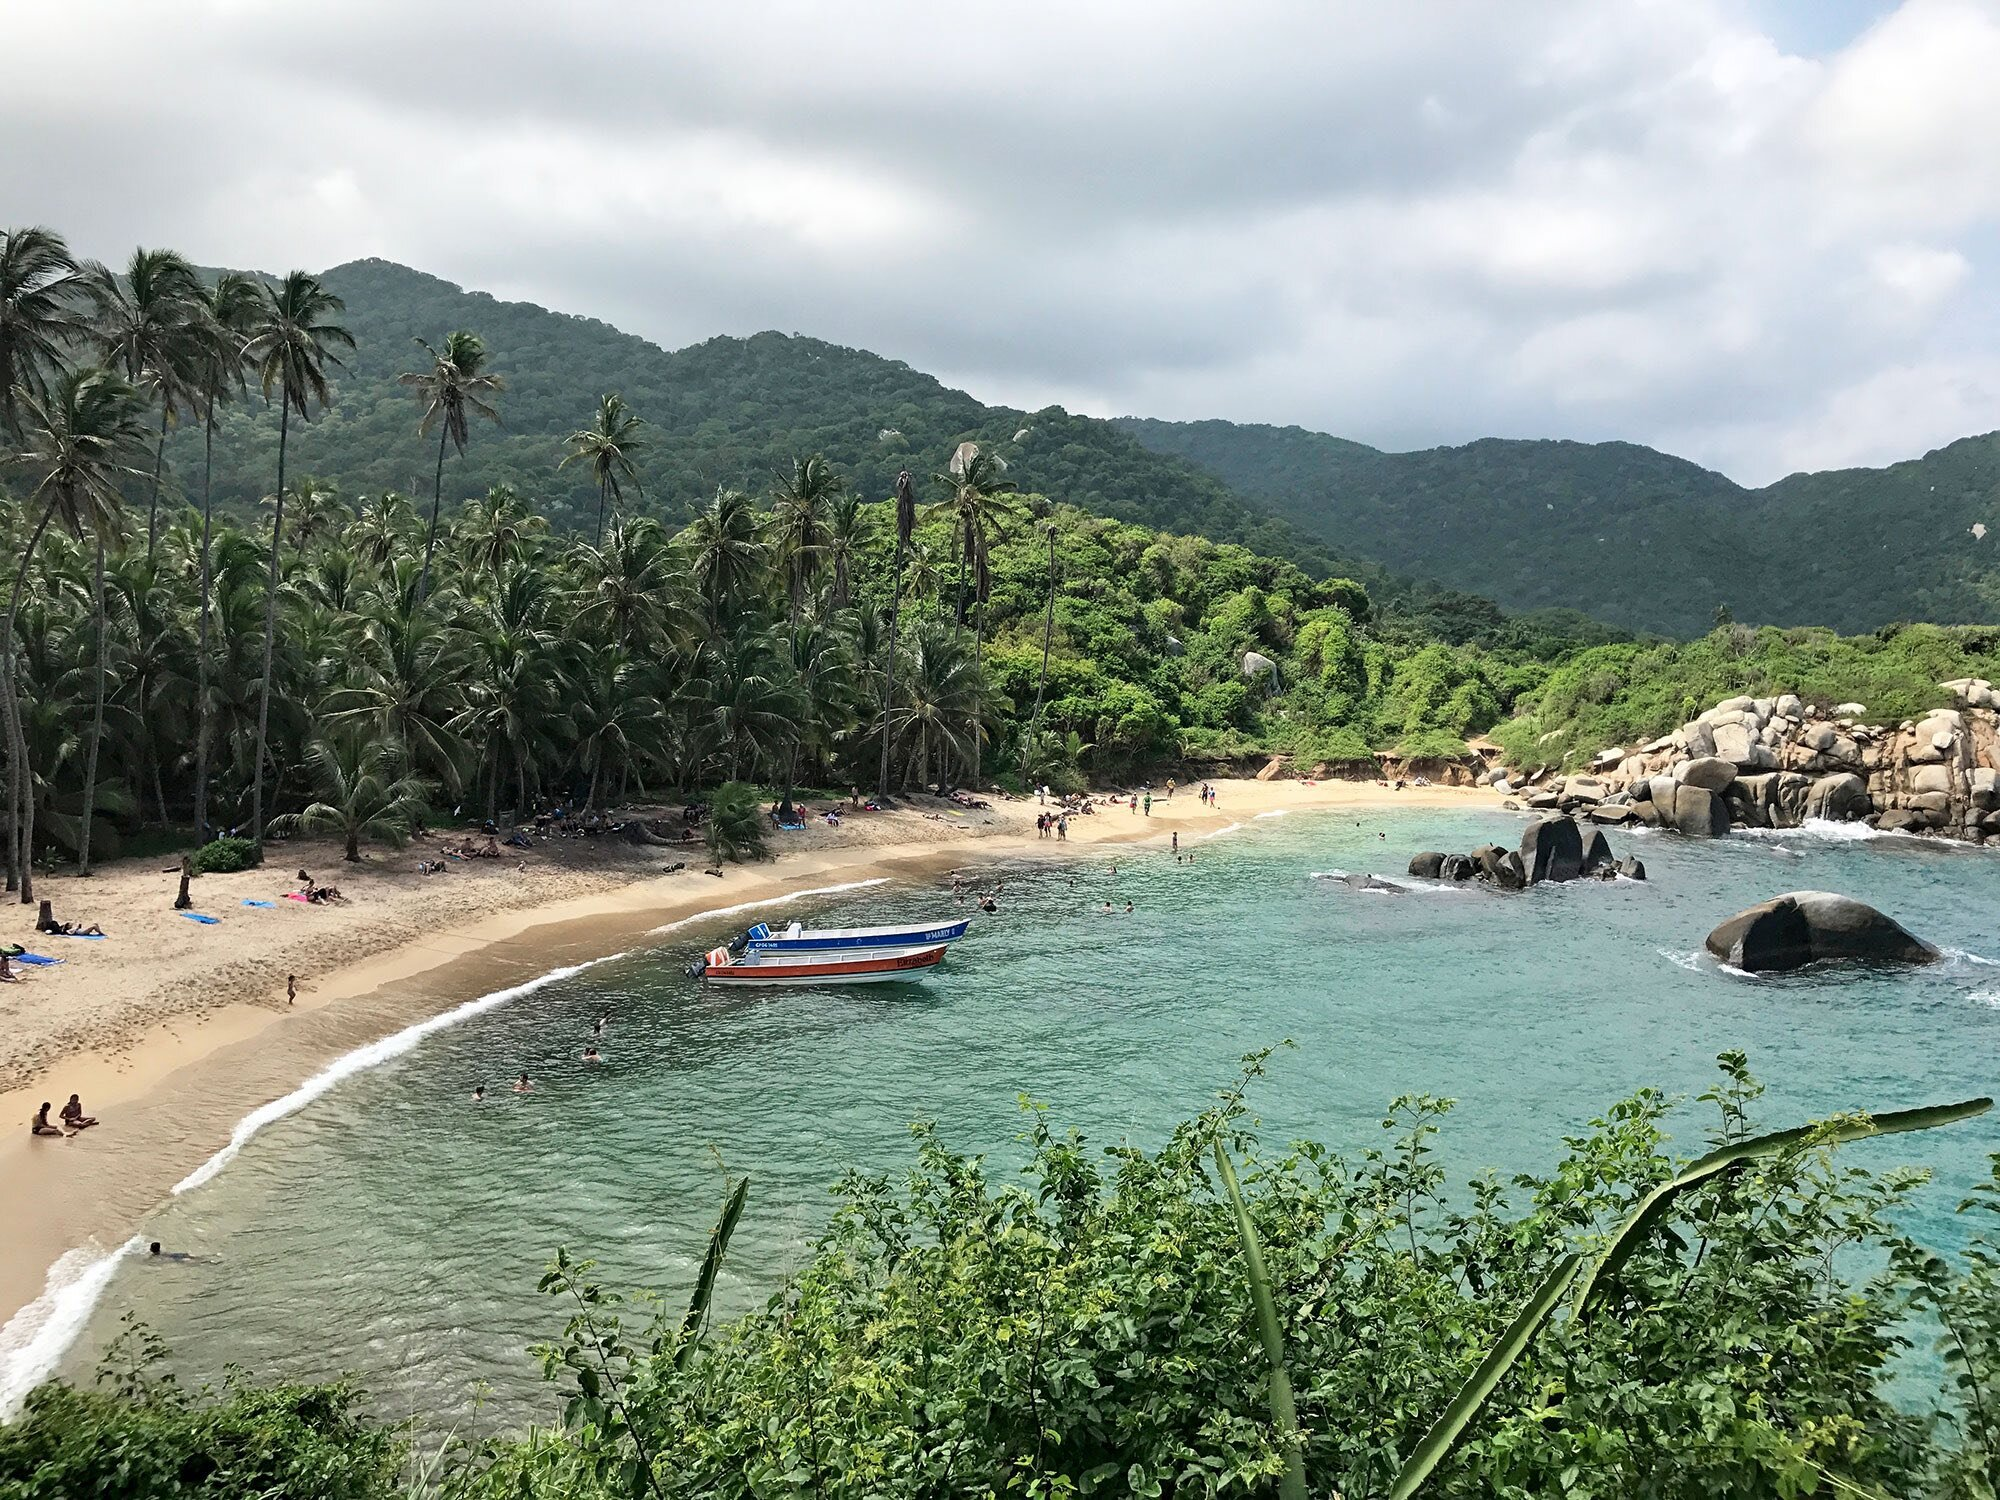 Tayrona-National-Park-Colombia-Cabo-San-Juan-beach2.jpg